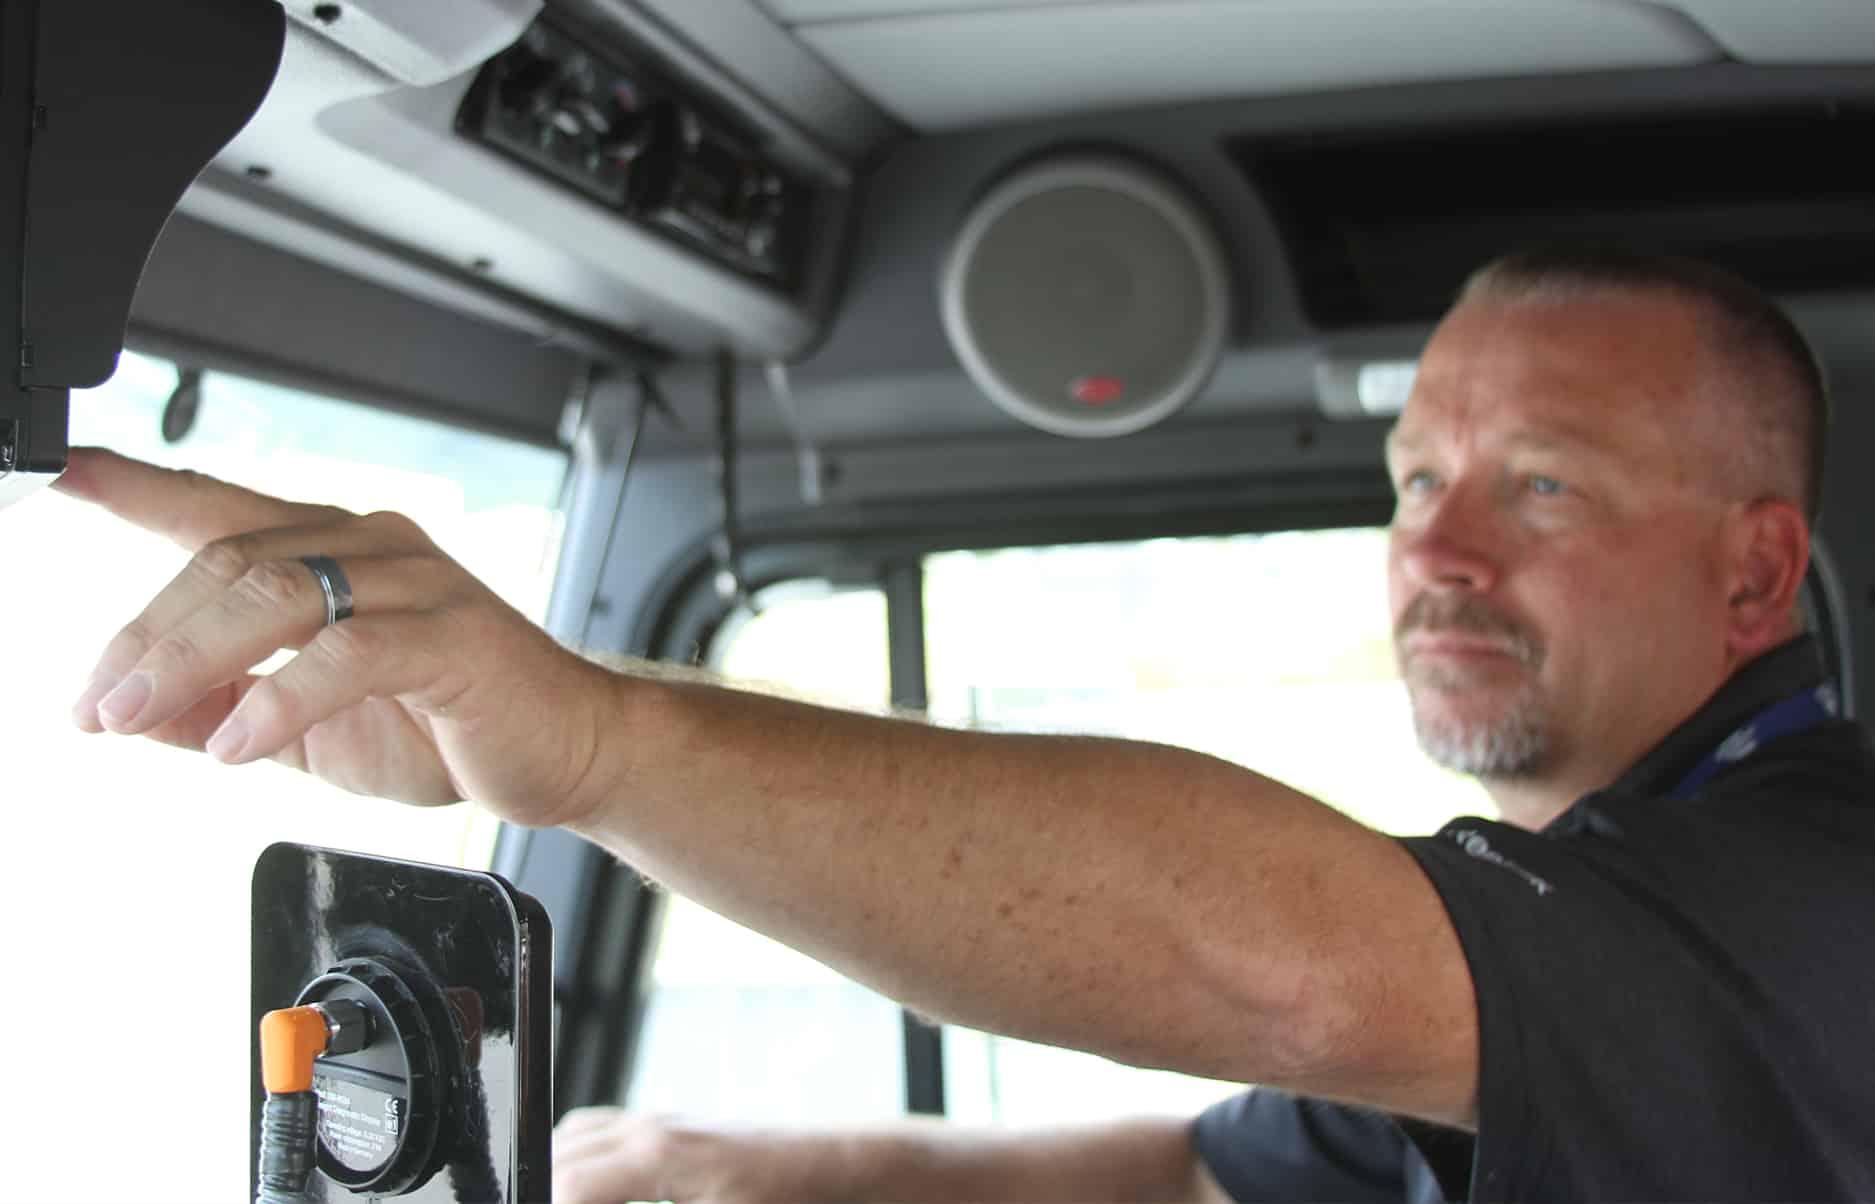 3rd Eye Truck Camera Systems